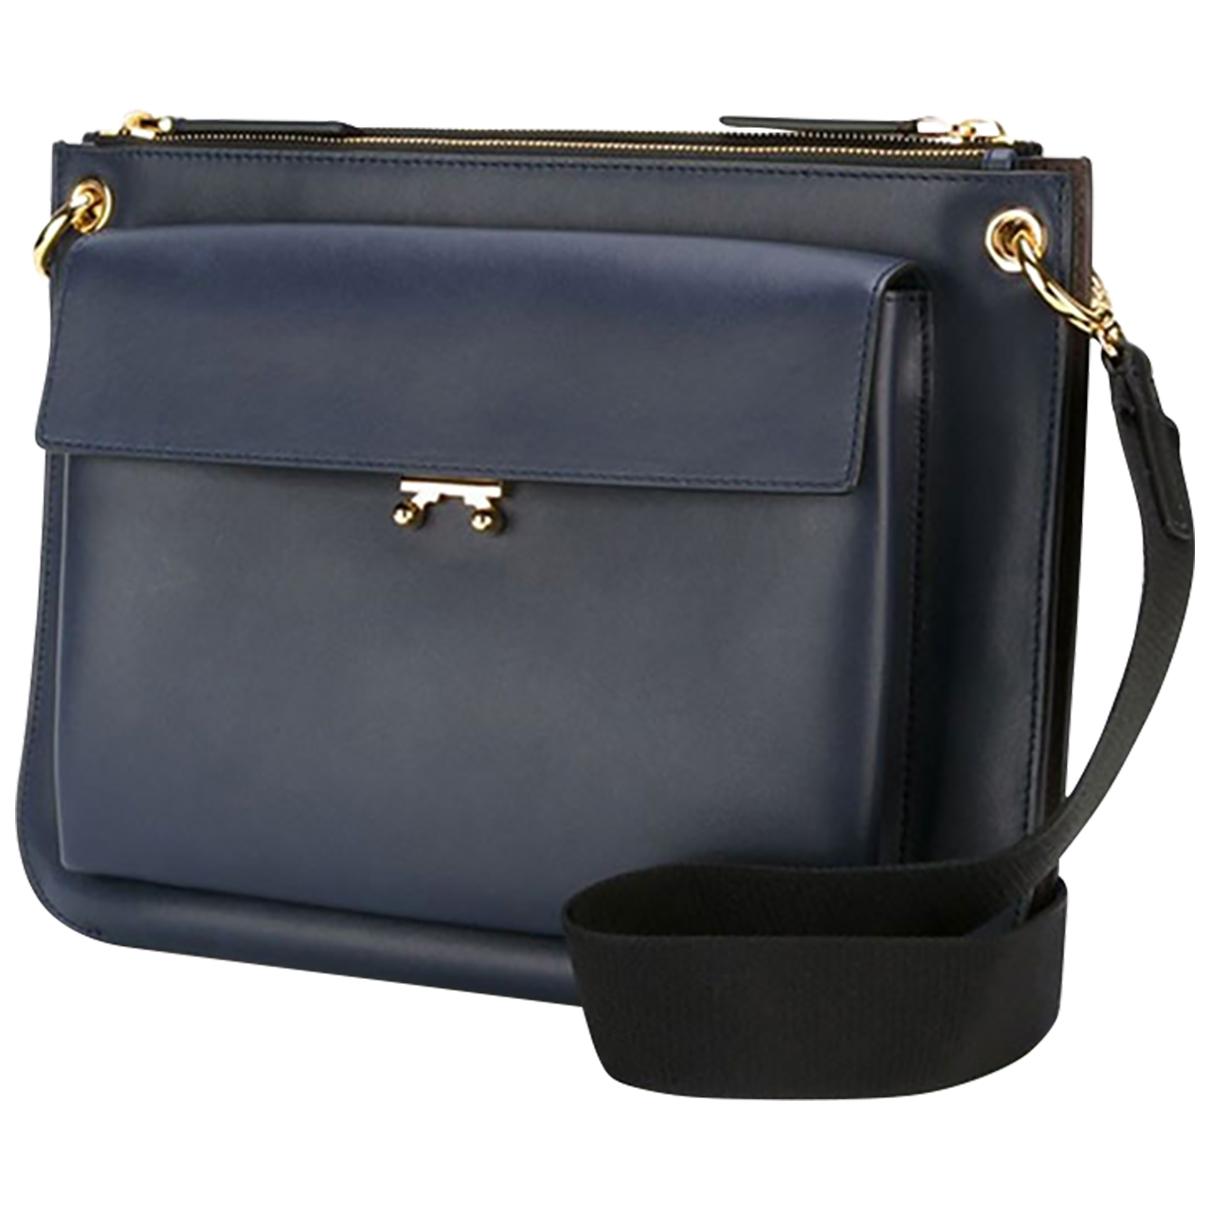 Marni \N Navy Leather handbag for Women \N